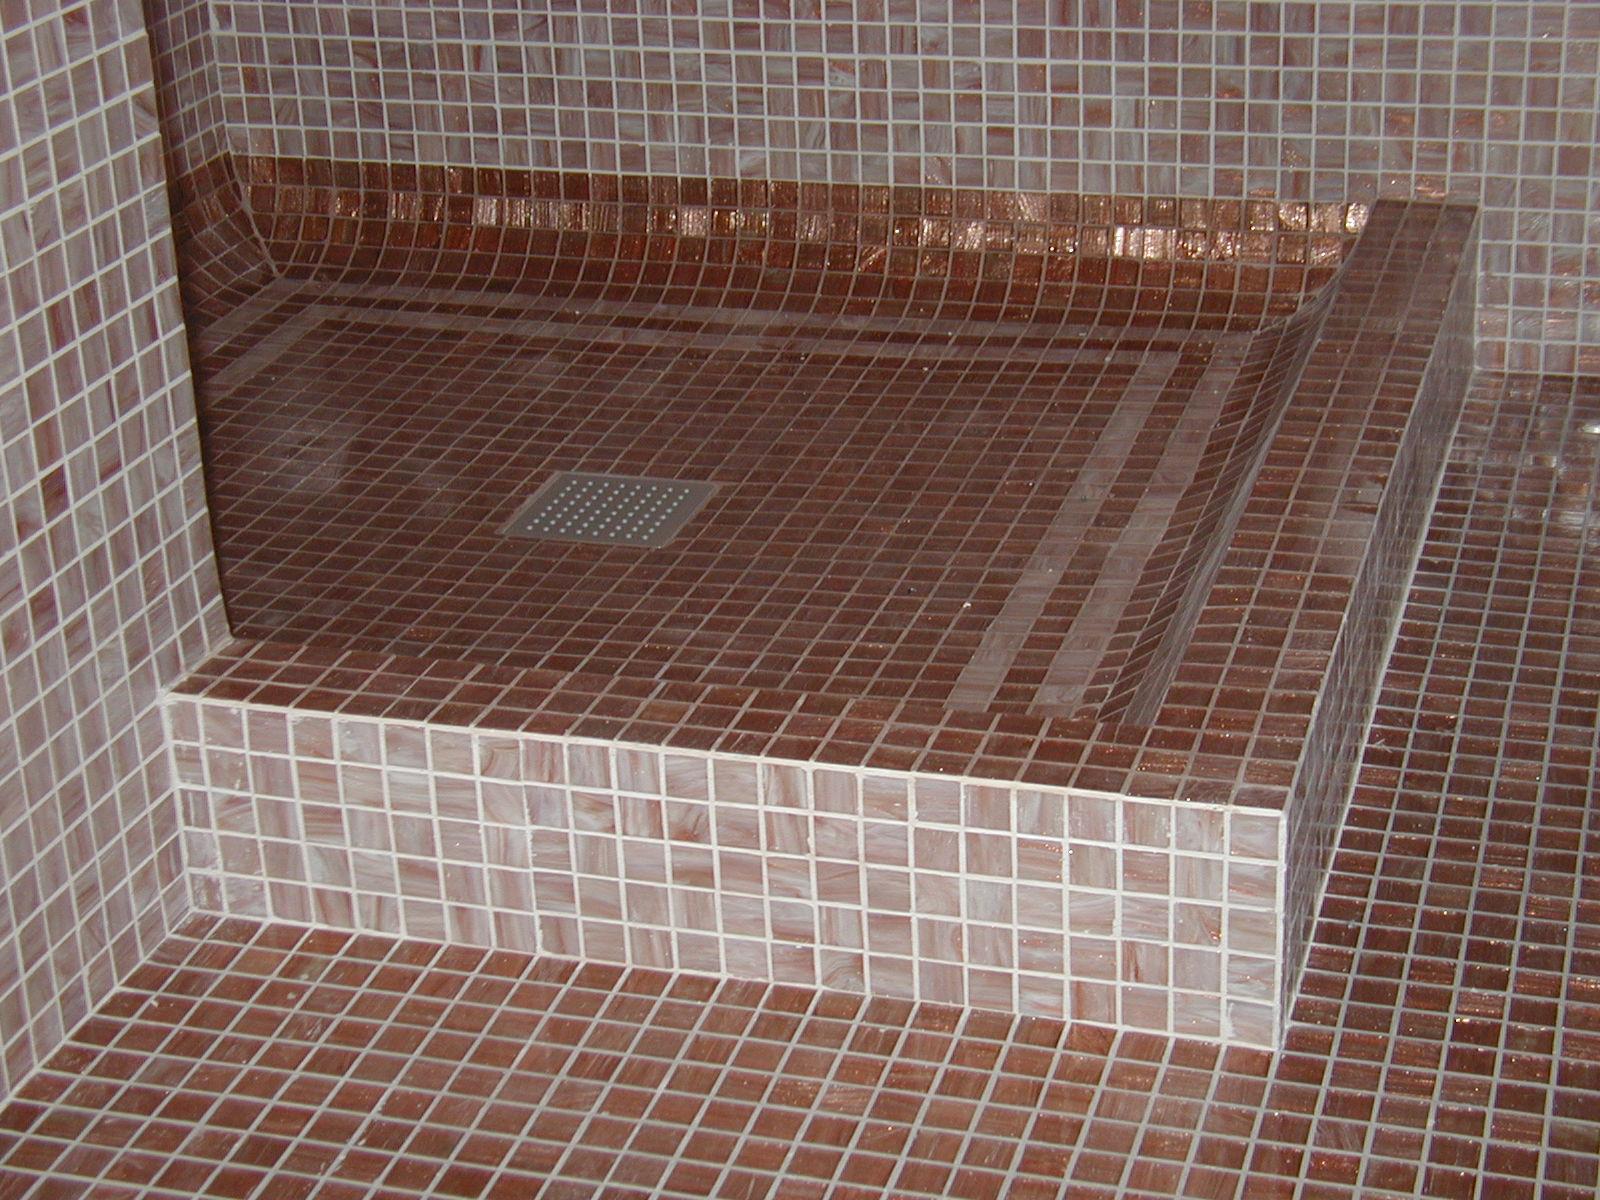 Metro quadro chioggia - Doccia a pavimento mosaico ...